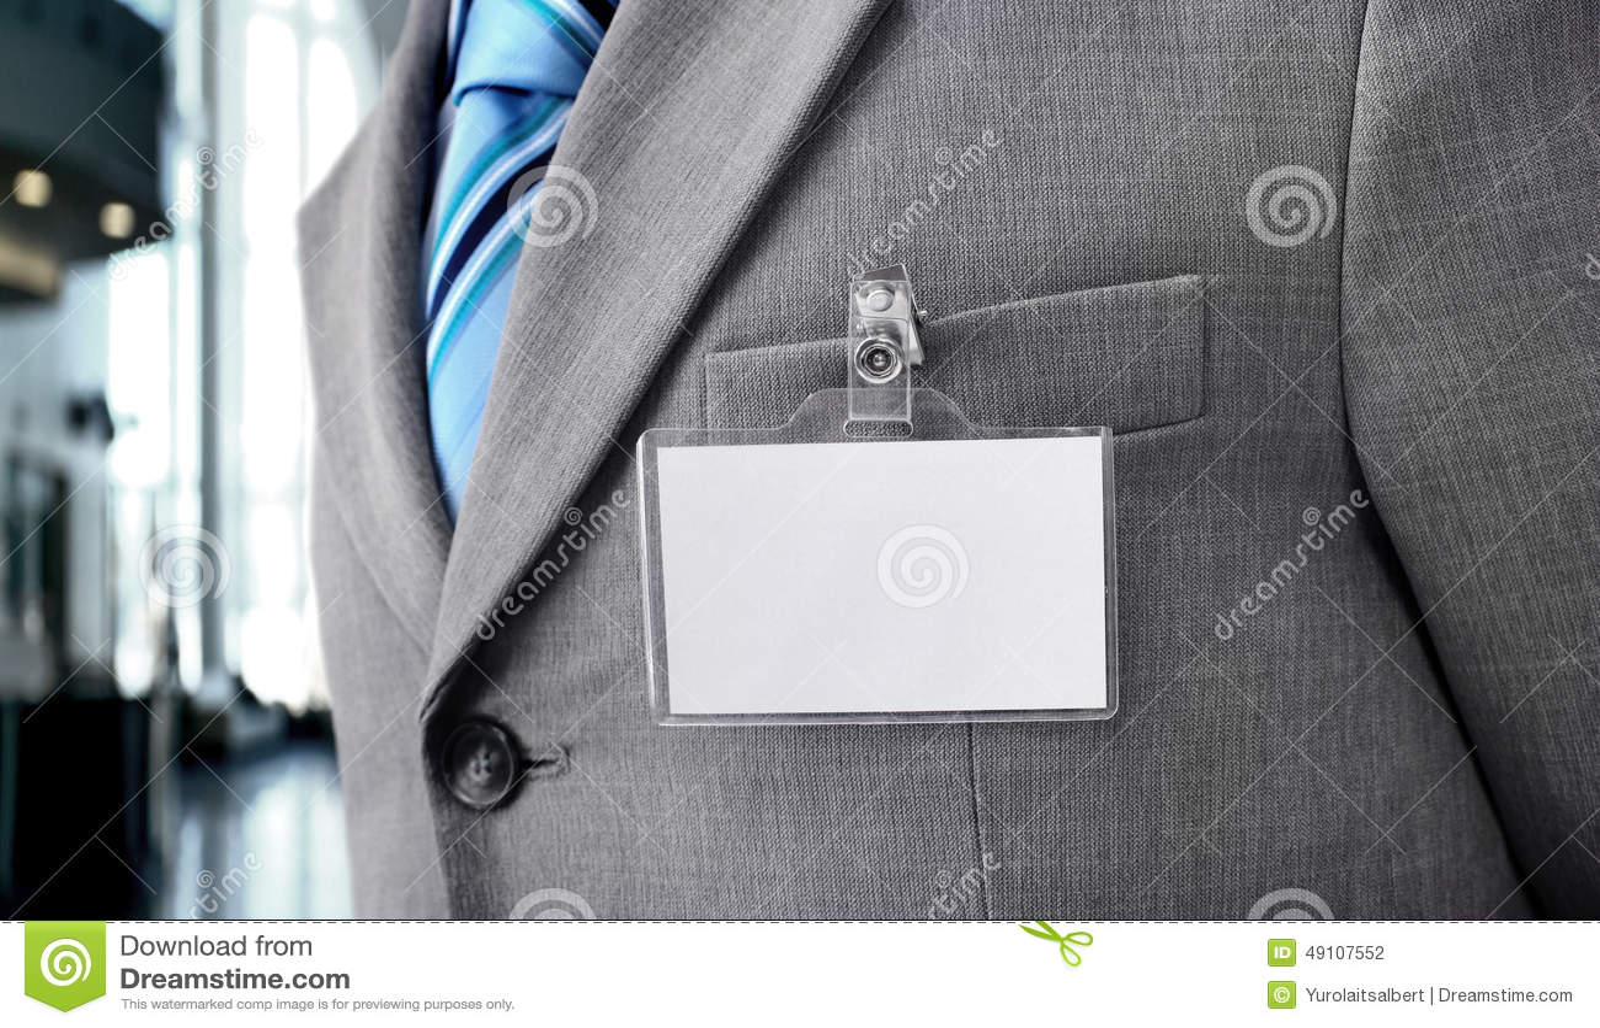 Tomt emblem på mäns torso